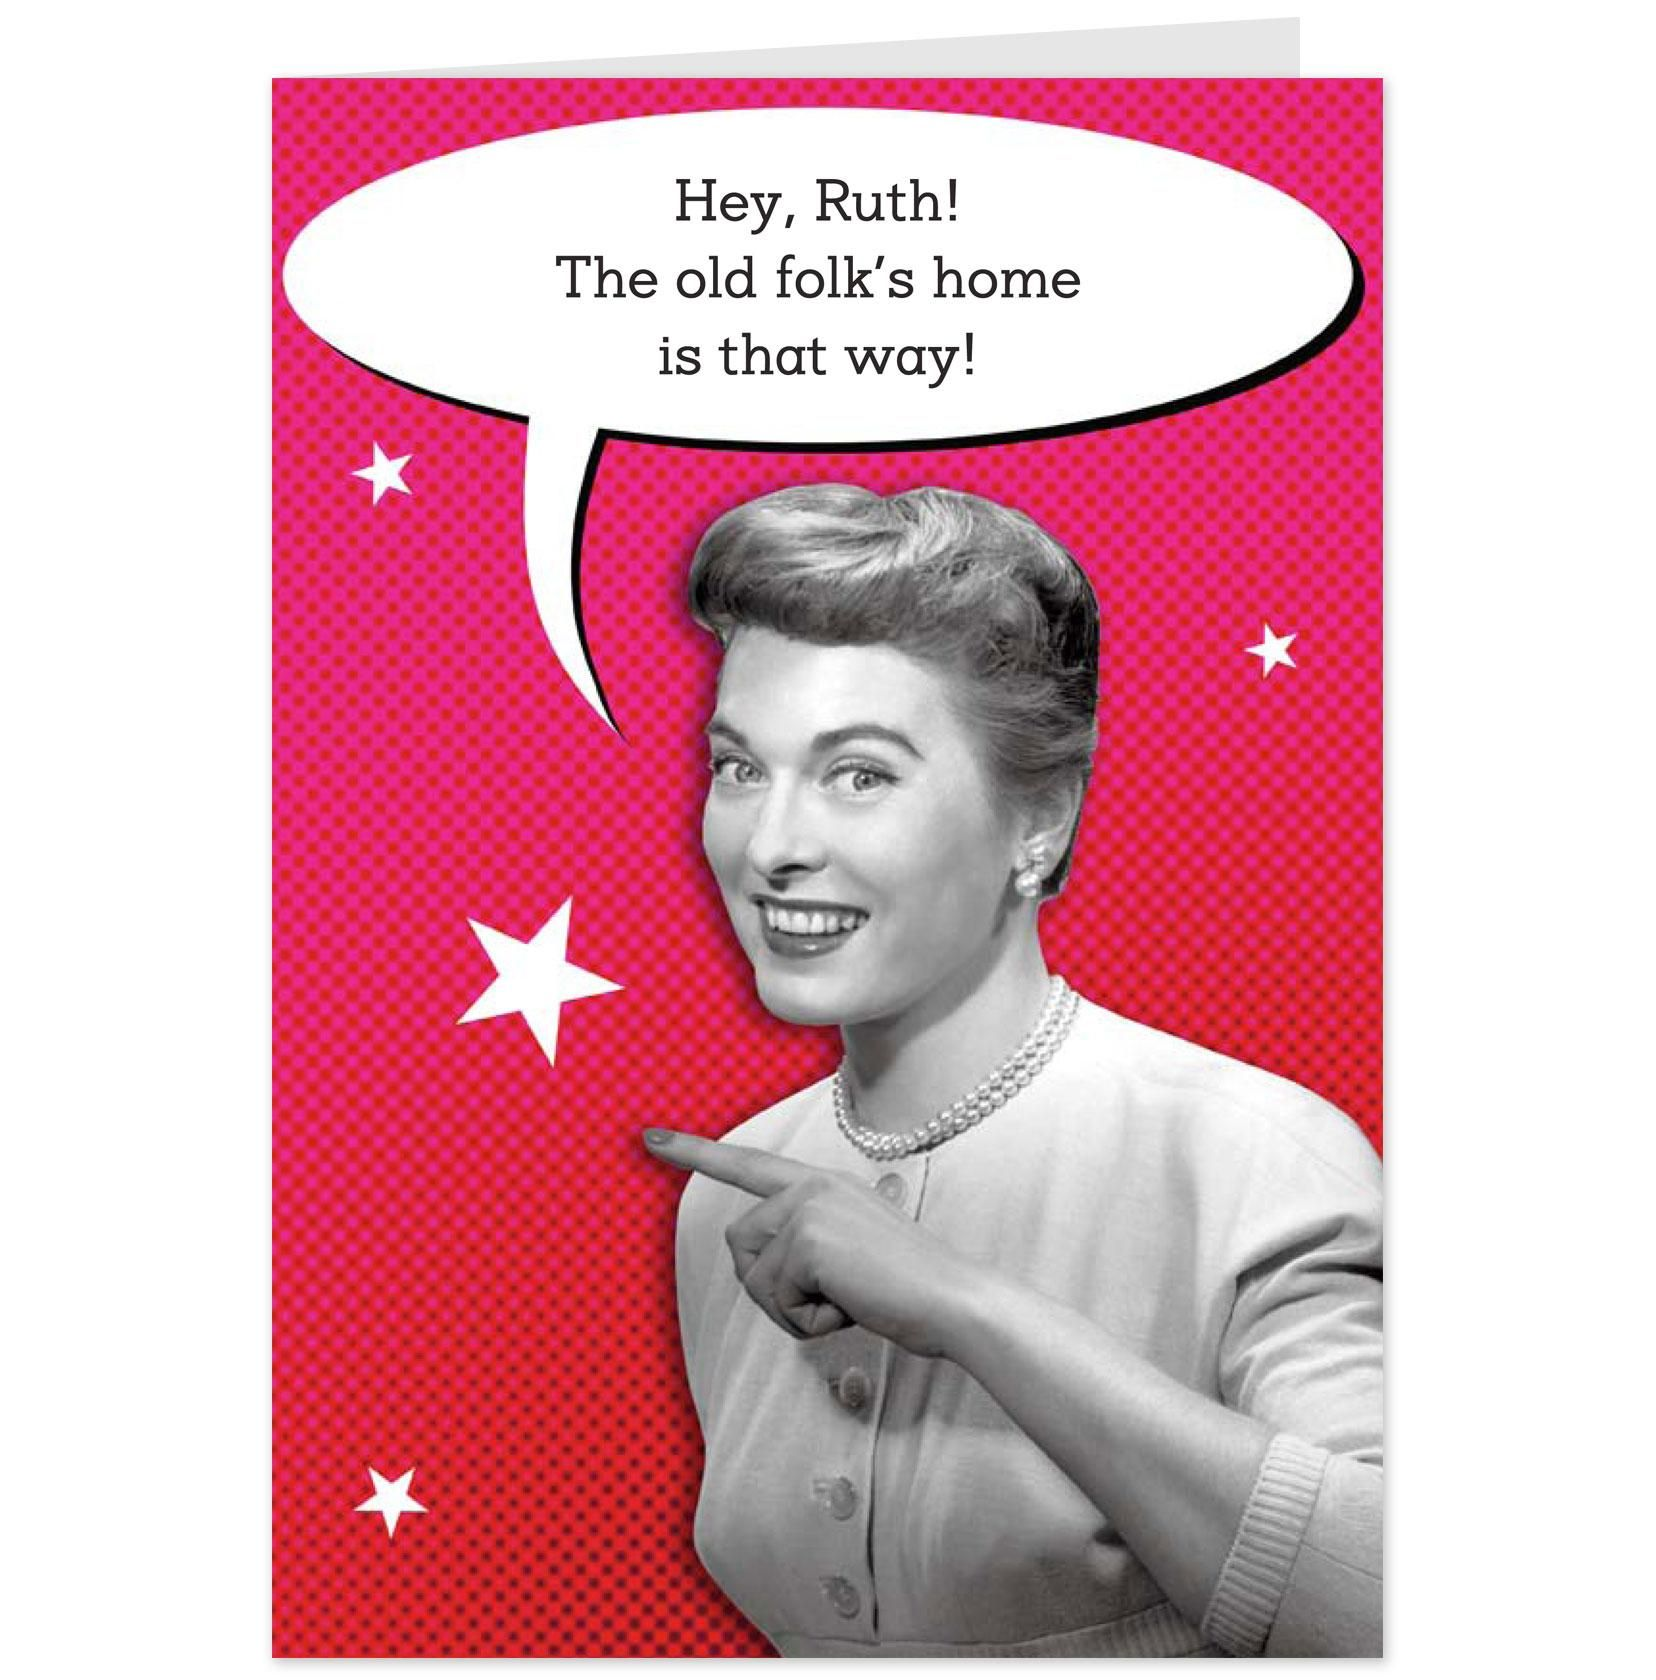 Funny Retro Women Funny Birthday Cards For Women Retro